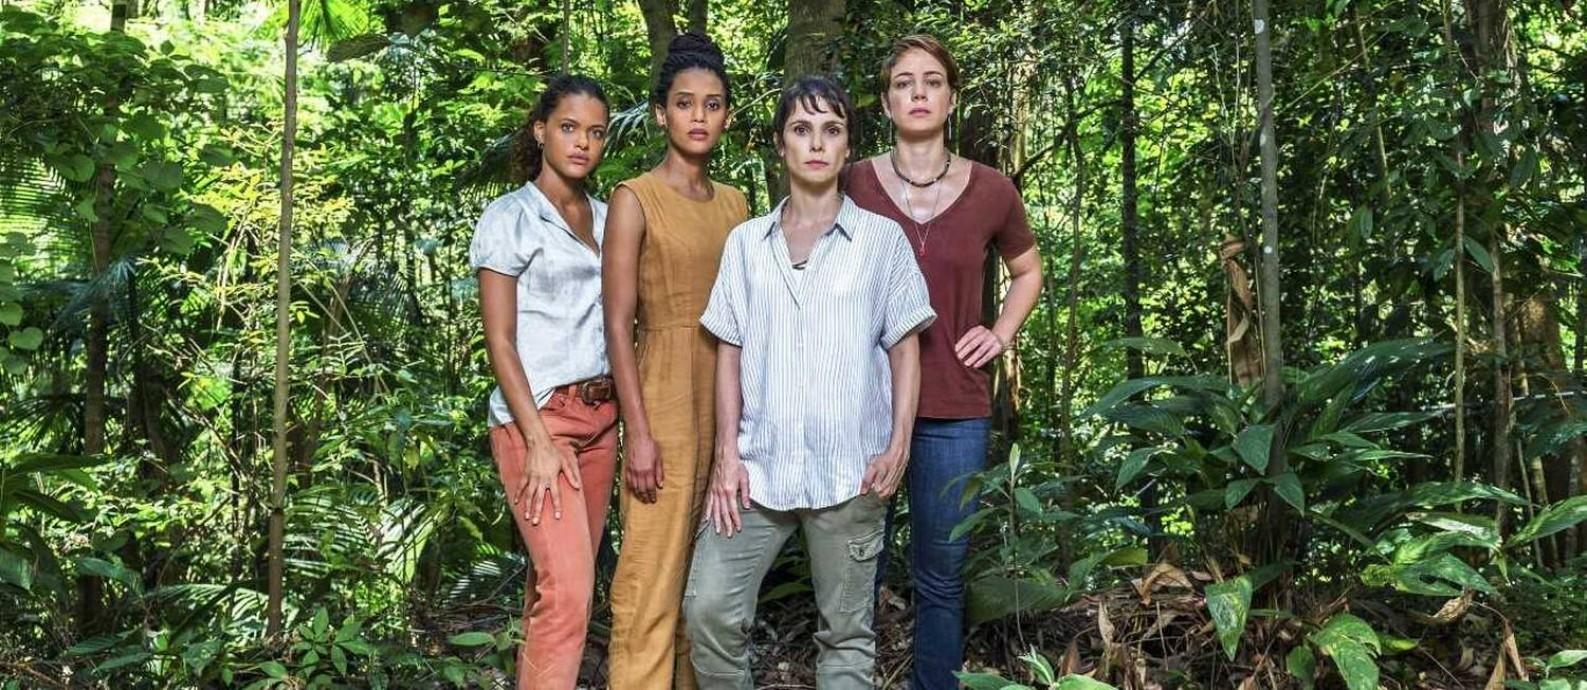 Clara (Thainá Duarte), Verônica (Taís Araújo), Natalie (Débora Falabella) e Luíza (Leandra Leal) Foto: Divulgação